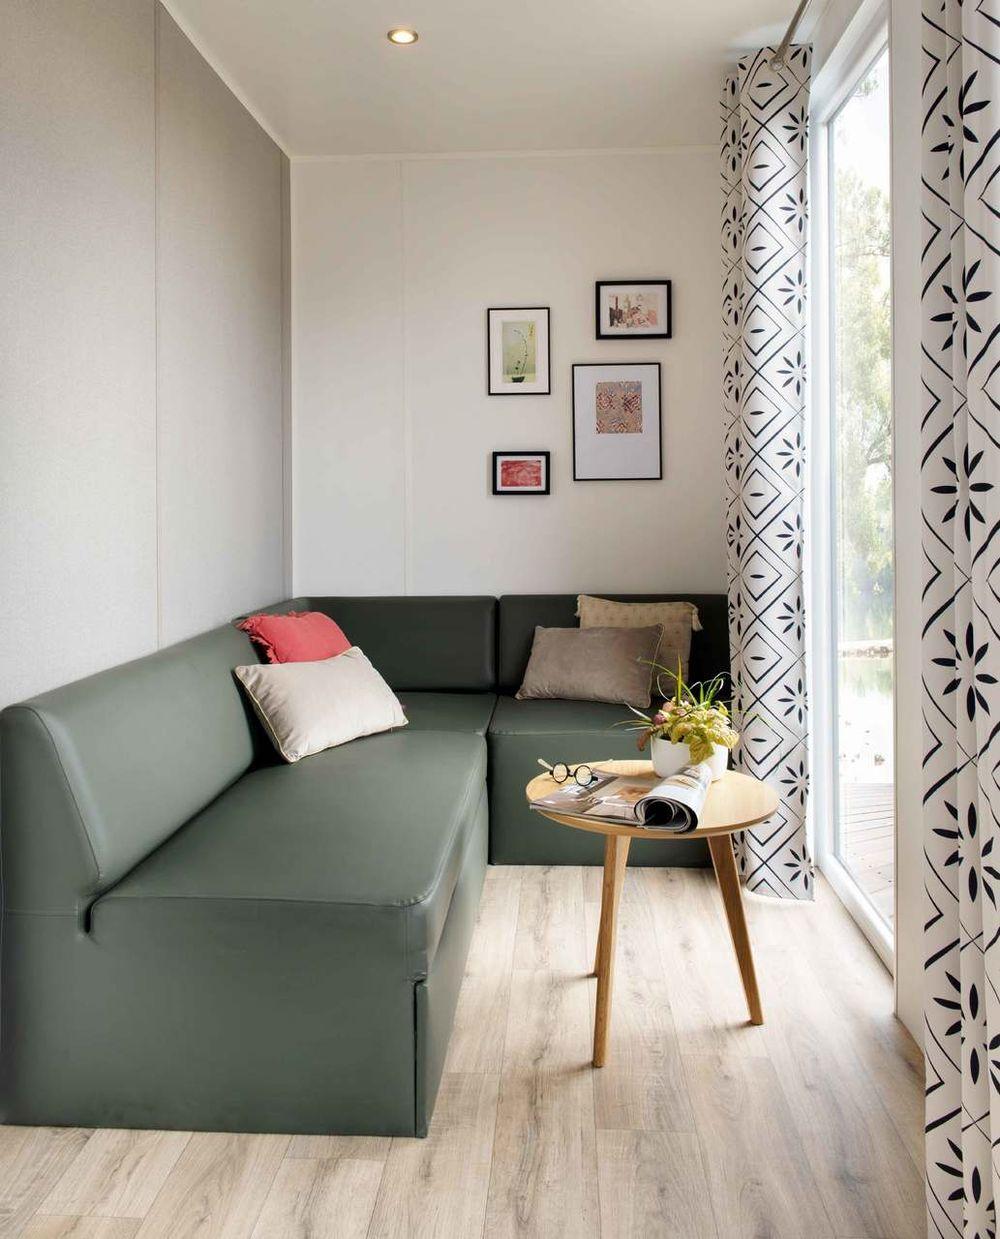 OHARA 845 3CH - 2021 - Mobil home Neuf - Zen Mobil homes